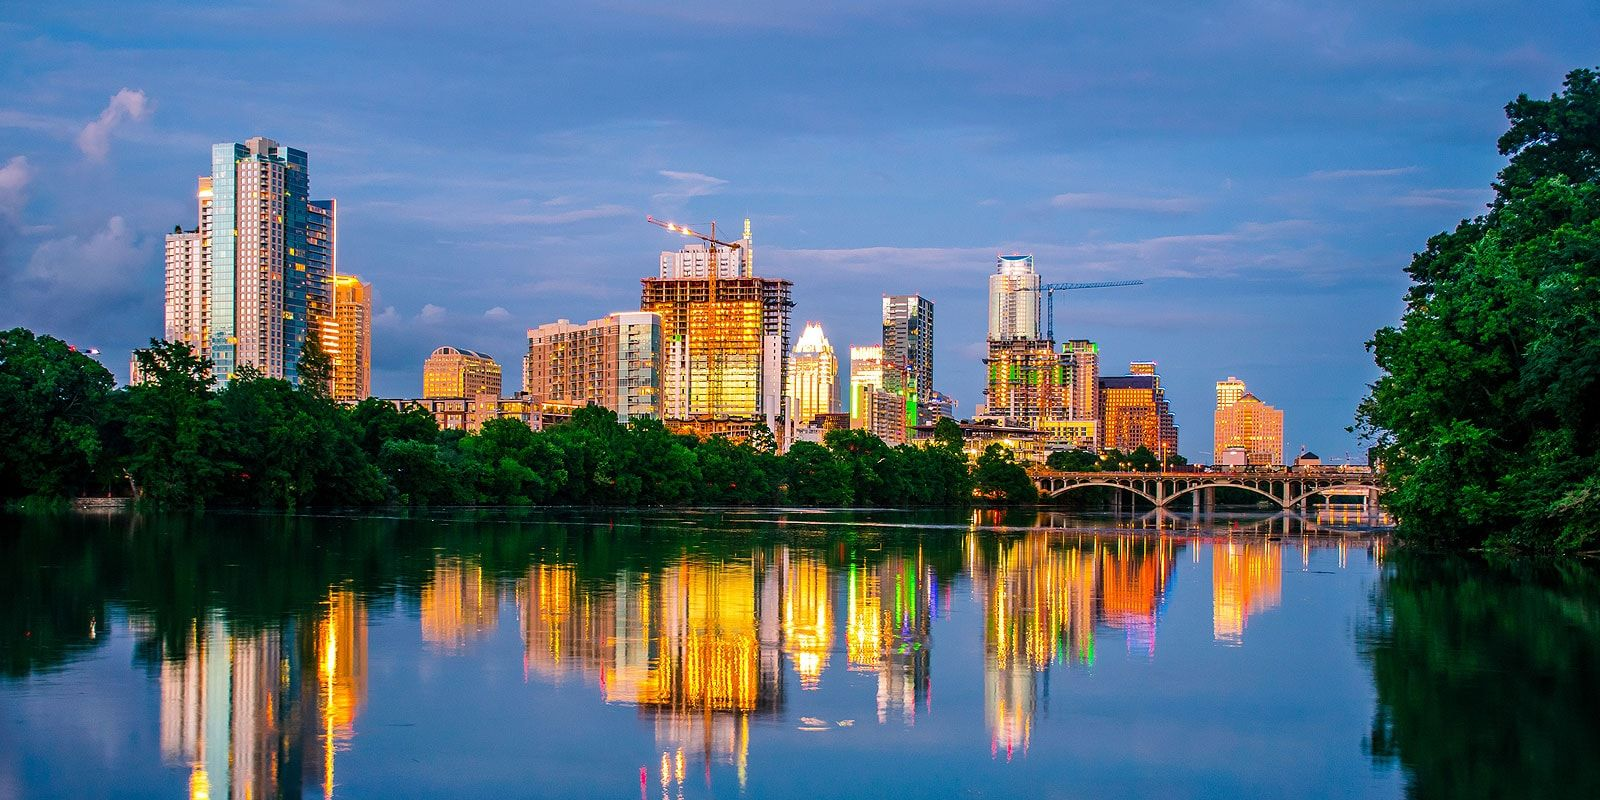 Cityscape of Austin from Zilker Metropolitan Park